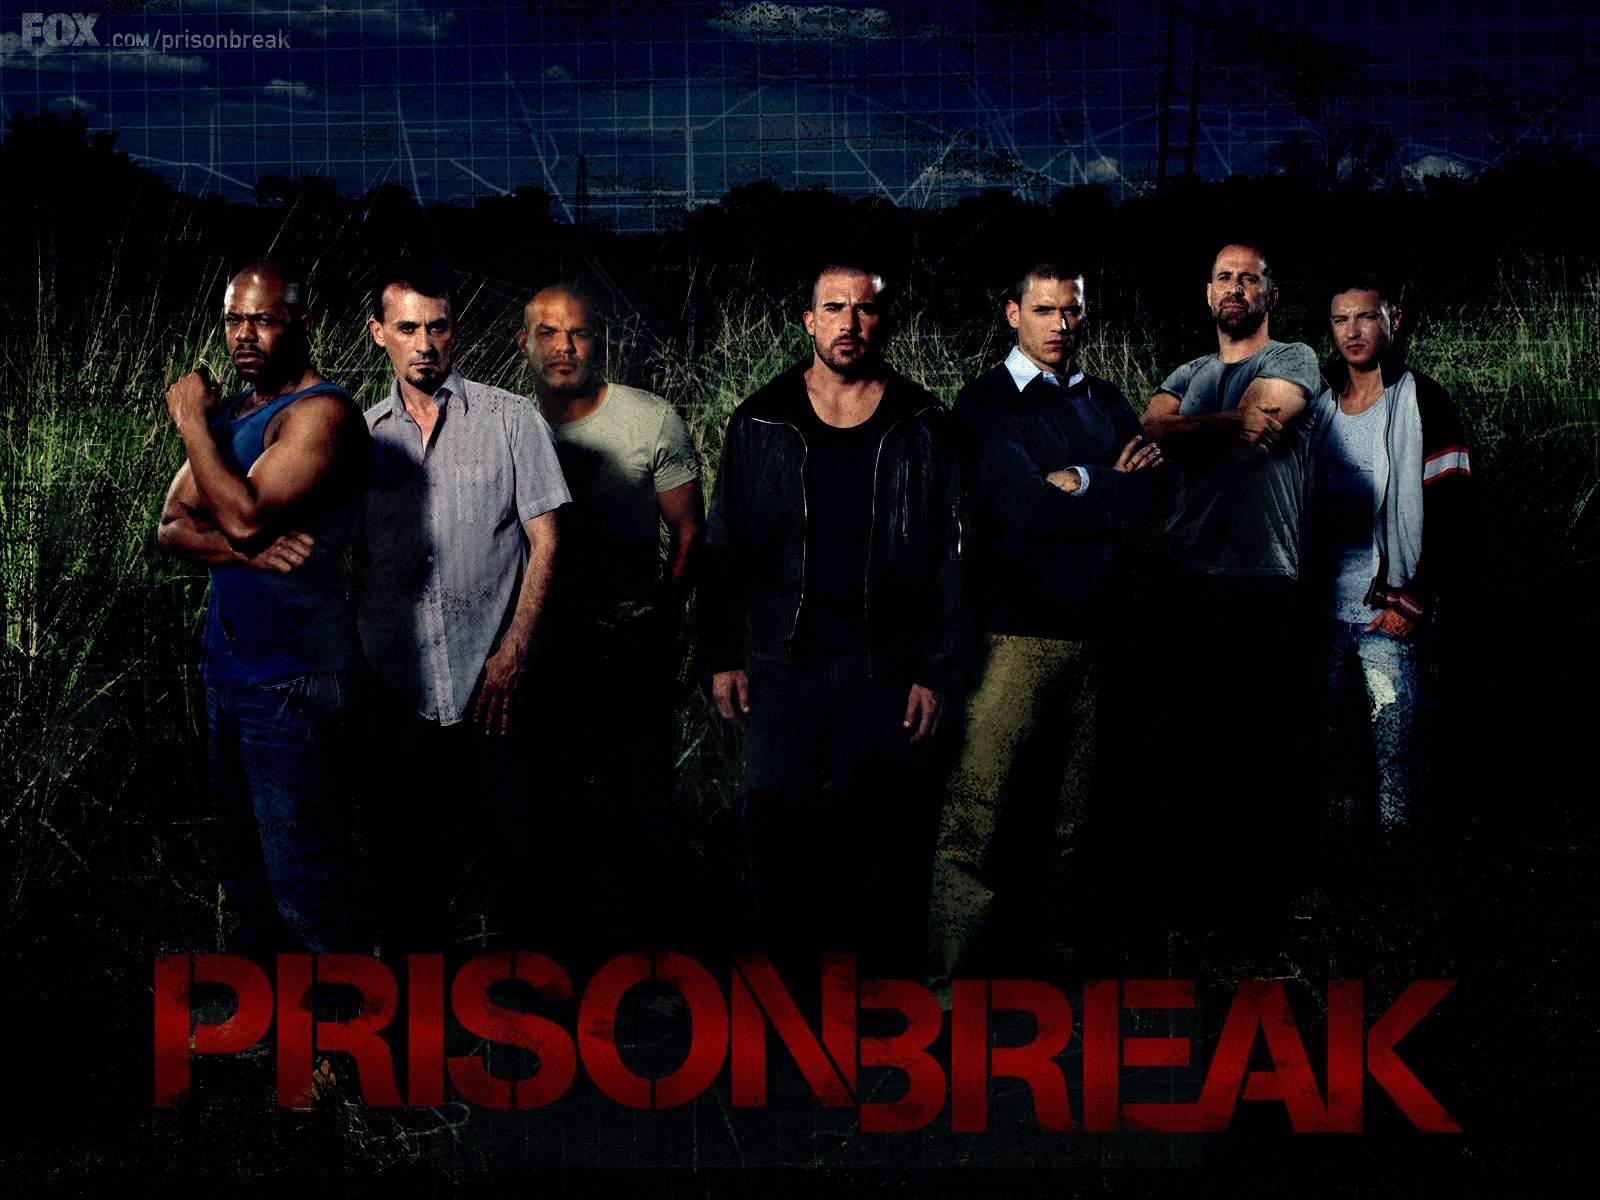 صور رائعة Prison_break1